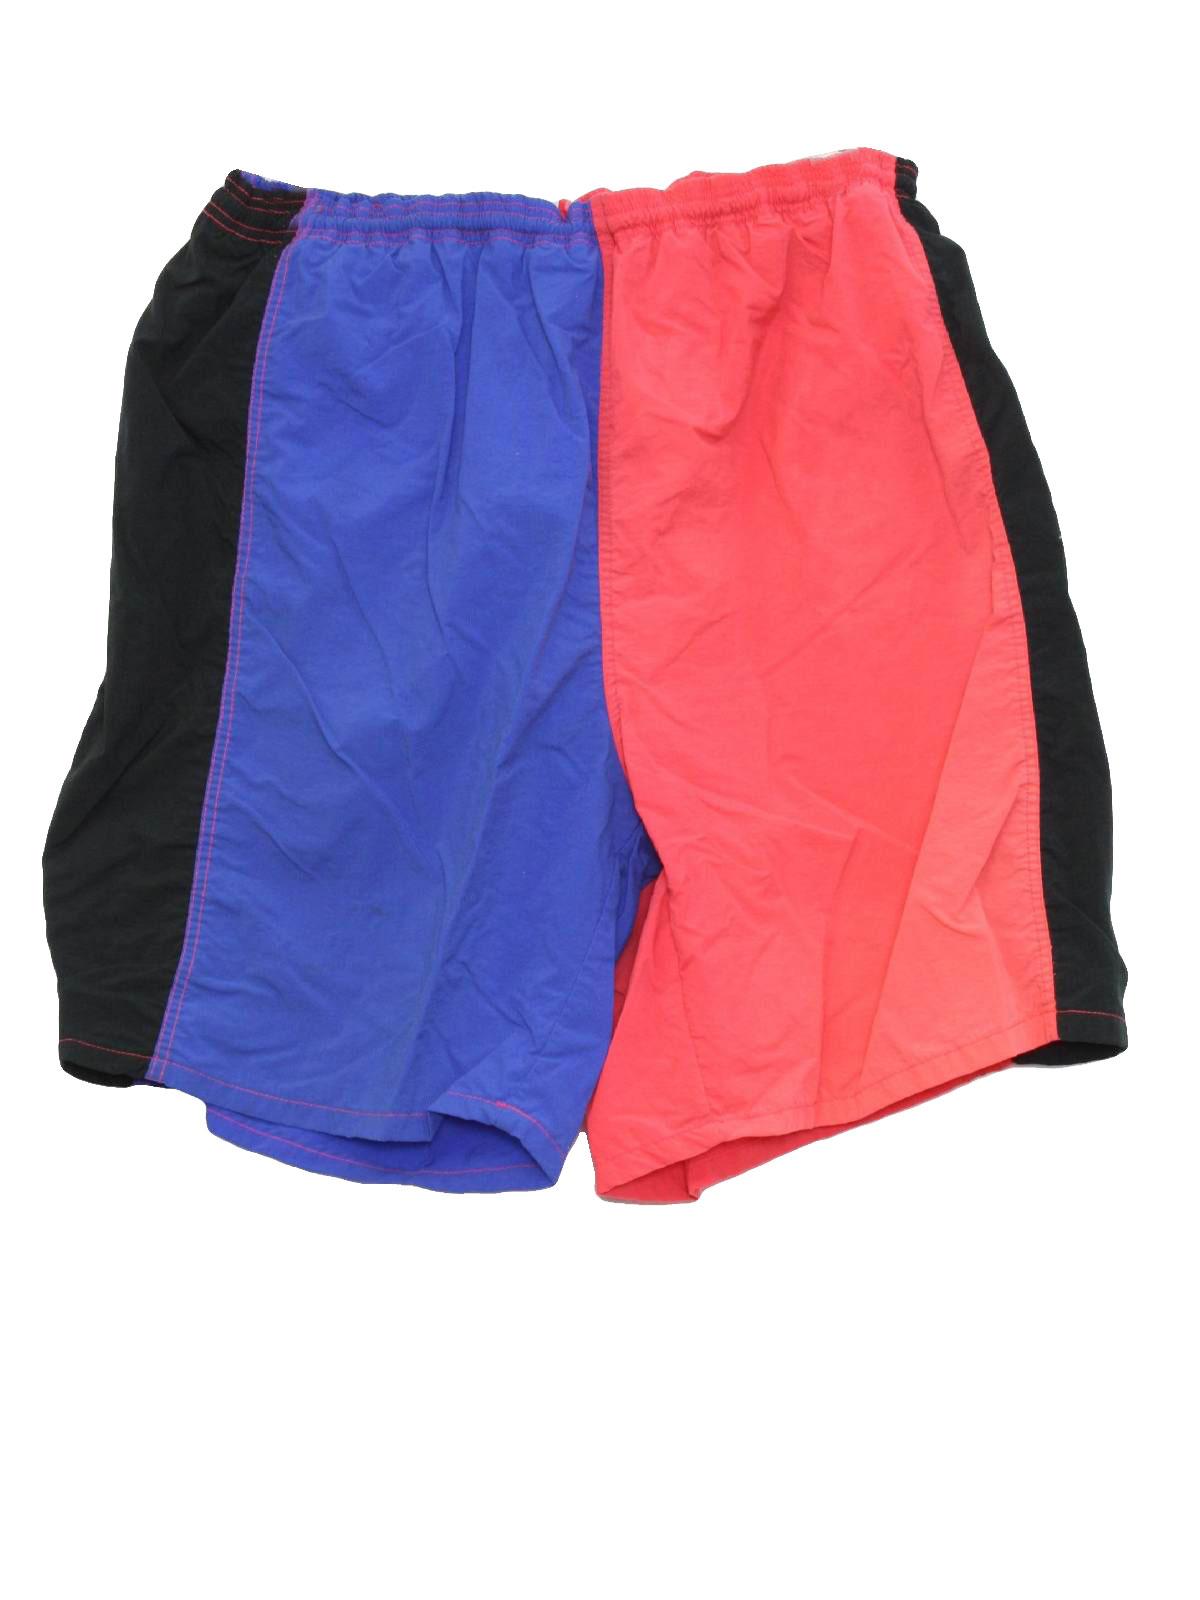 c7a48ee825 Retro 90's Swimsuit/Swimwear: 90s -Cheetah, Mervyns- Mens neon coral ...